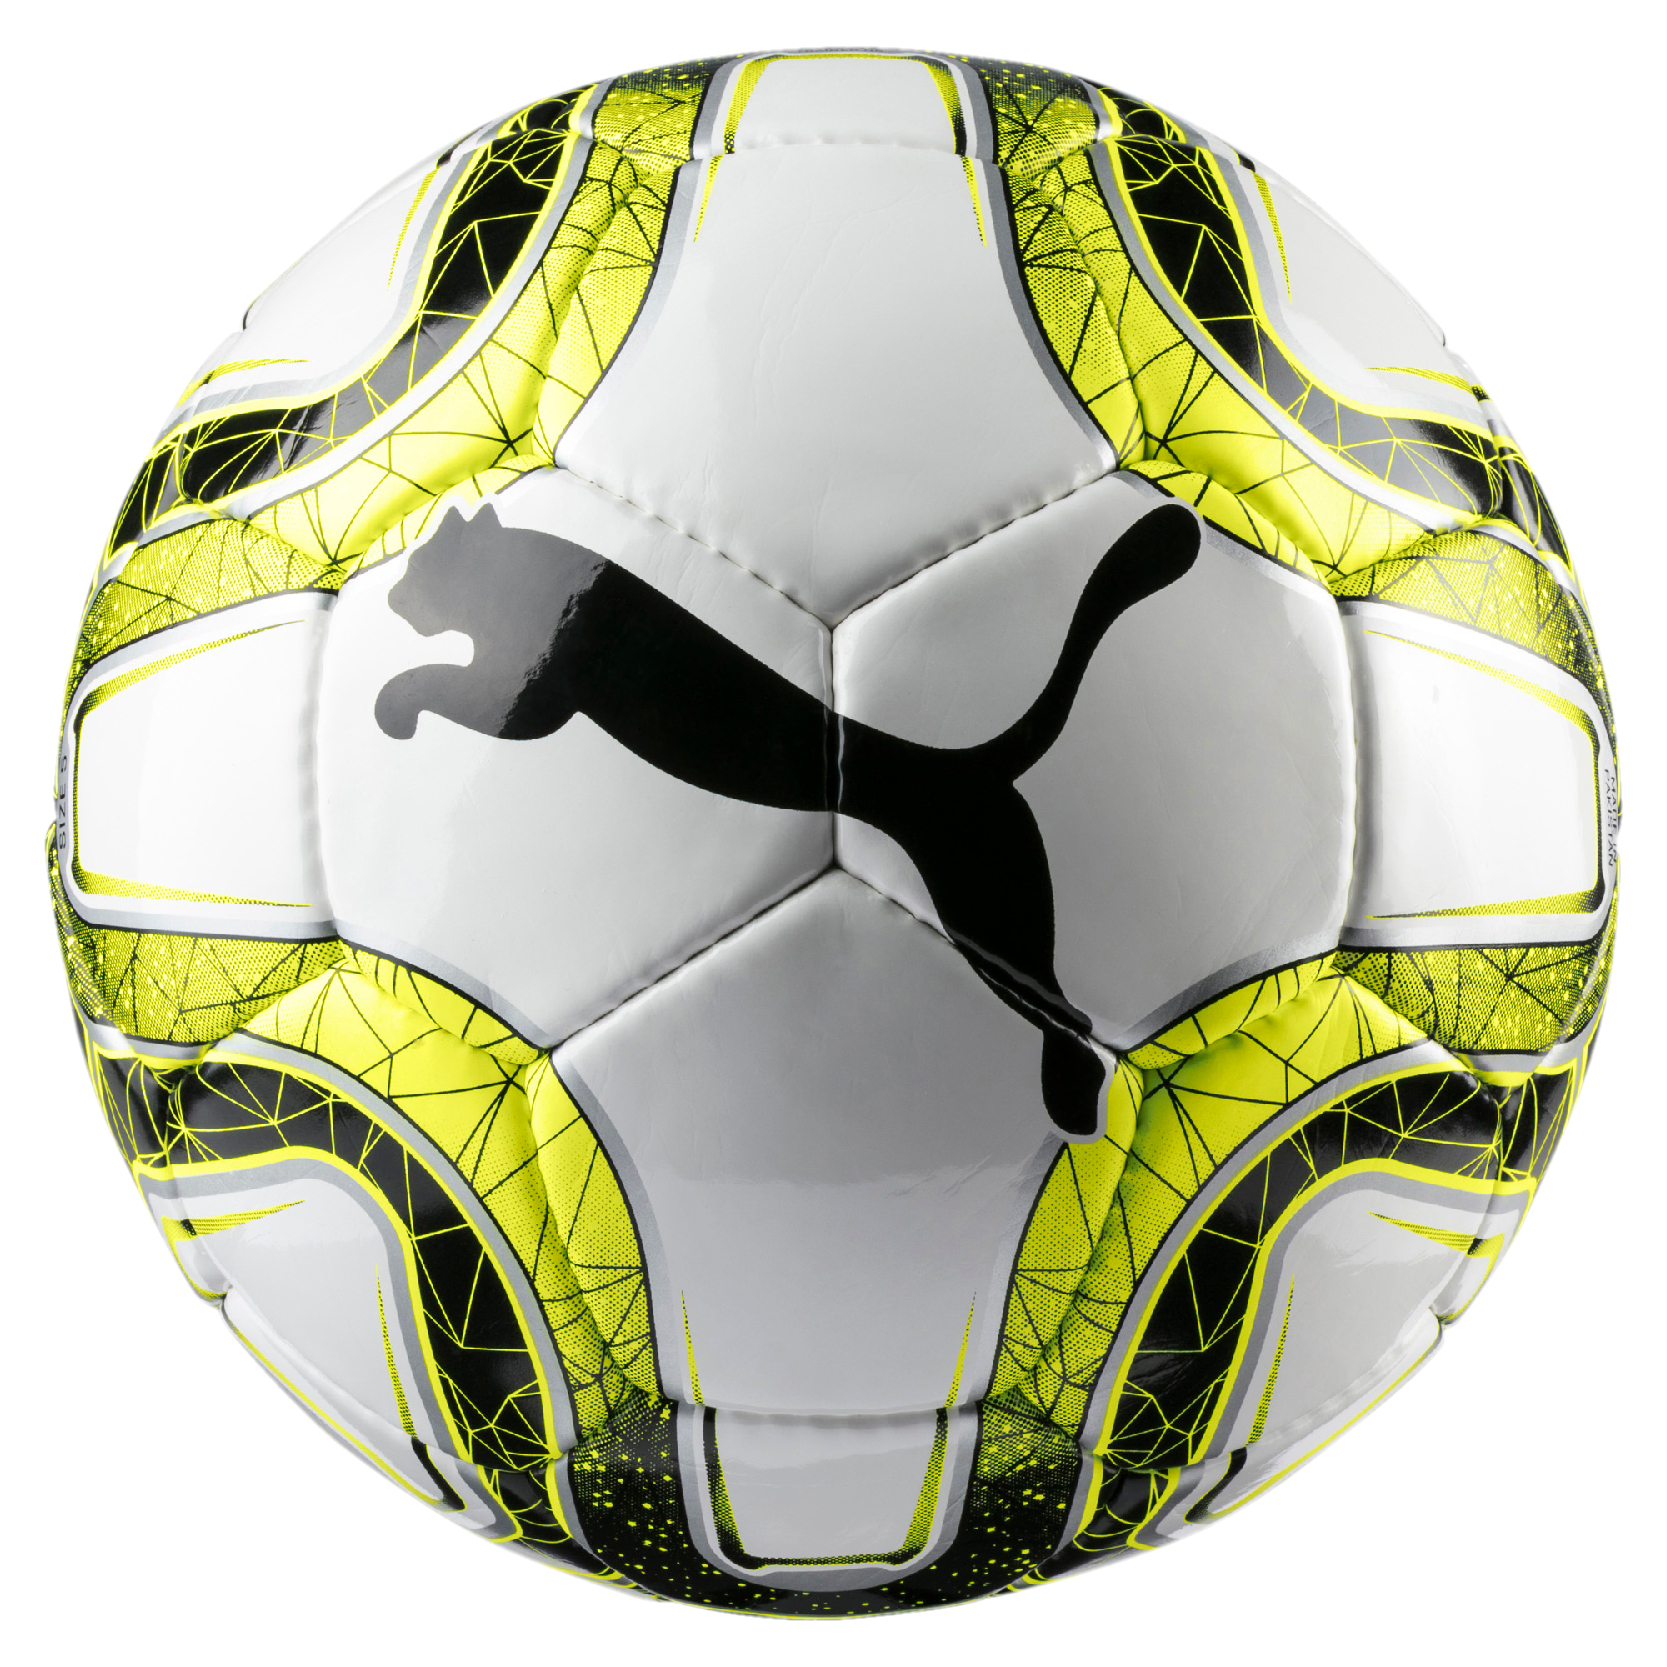 Ballon de Foot Puma Final 5 HS Trainer jaune